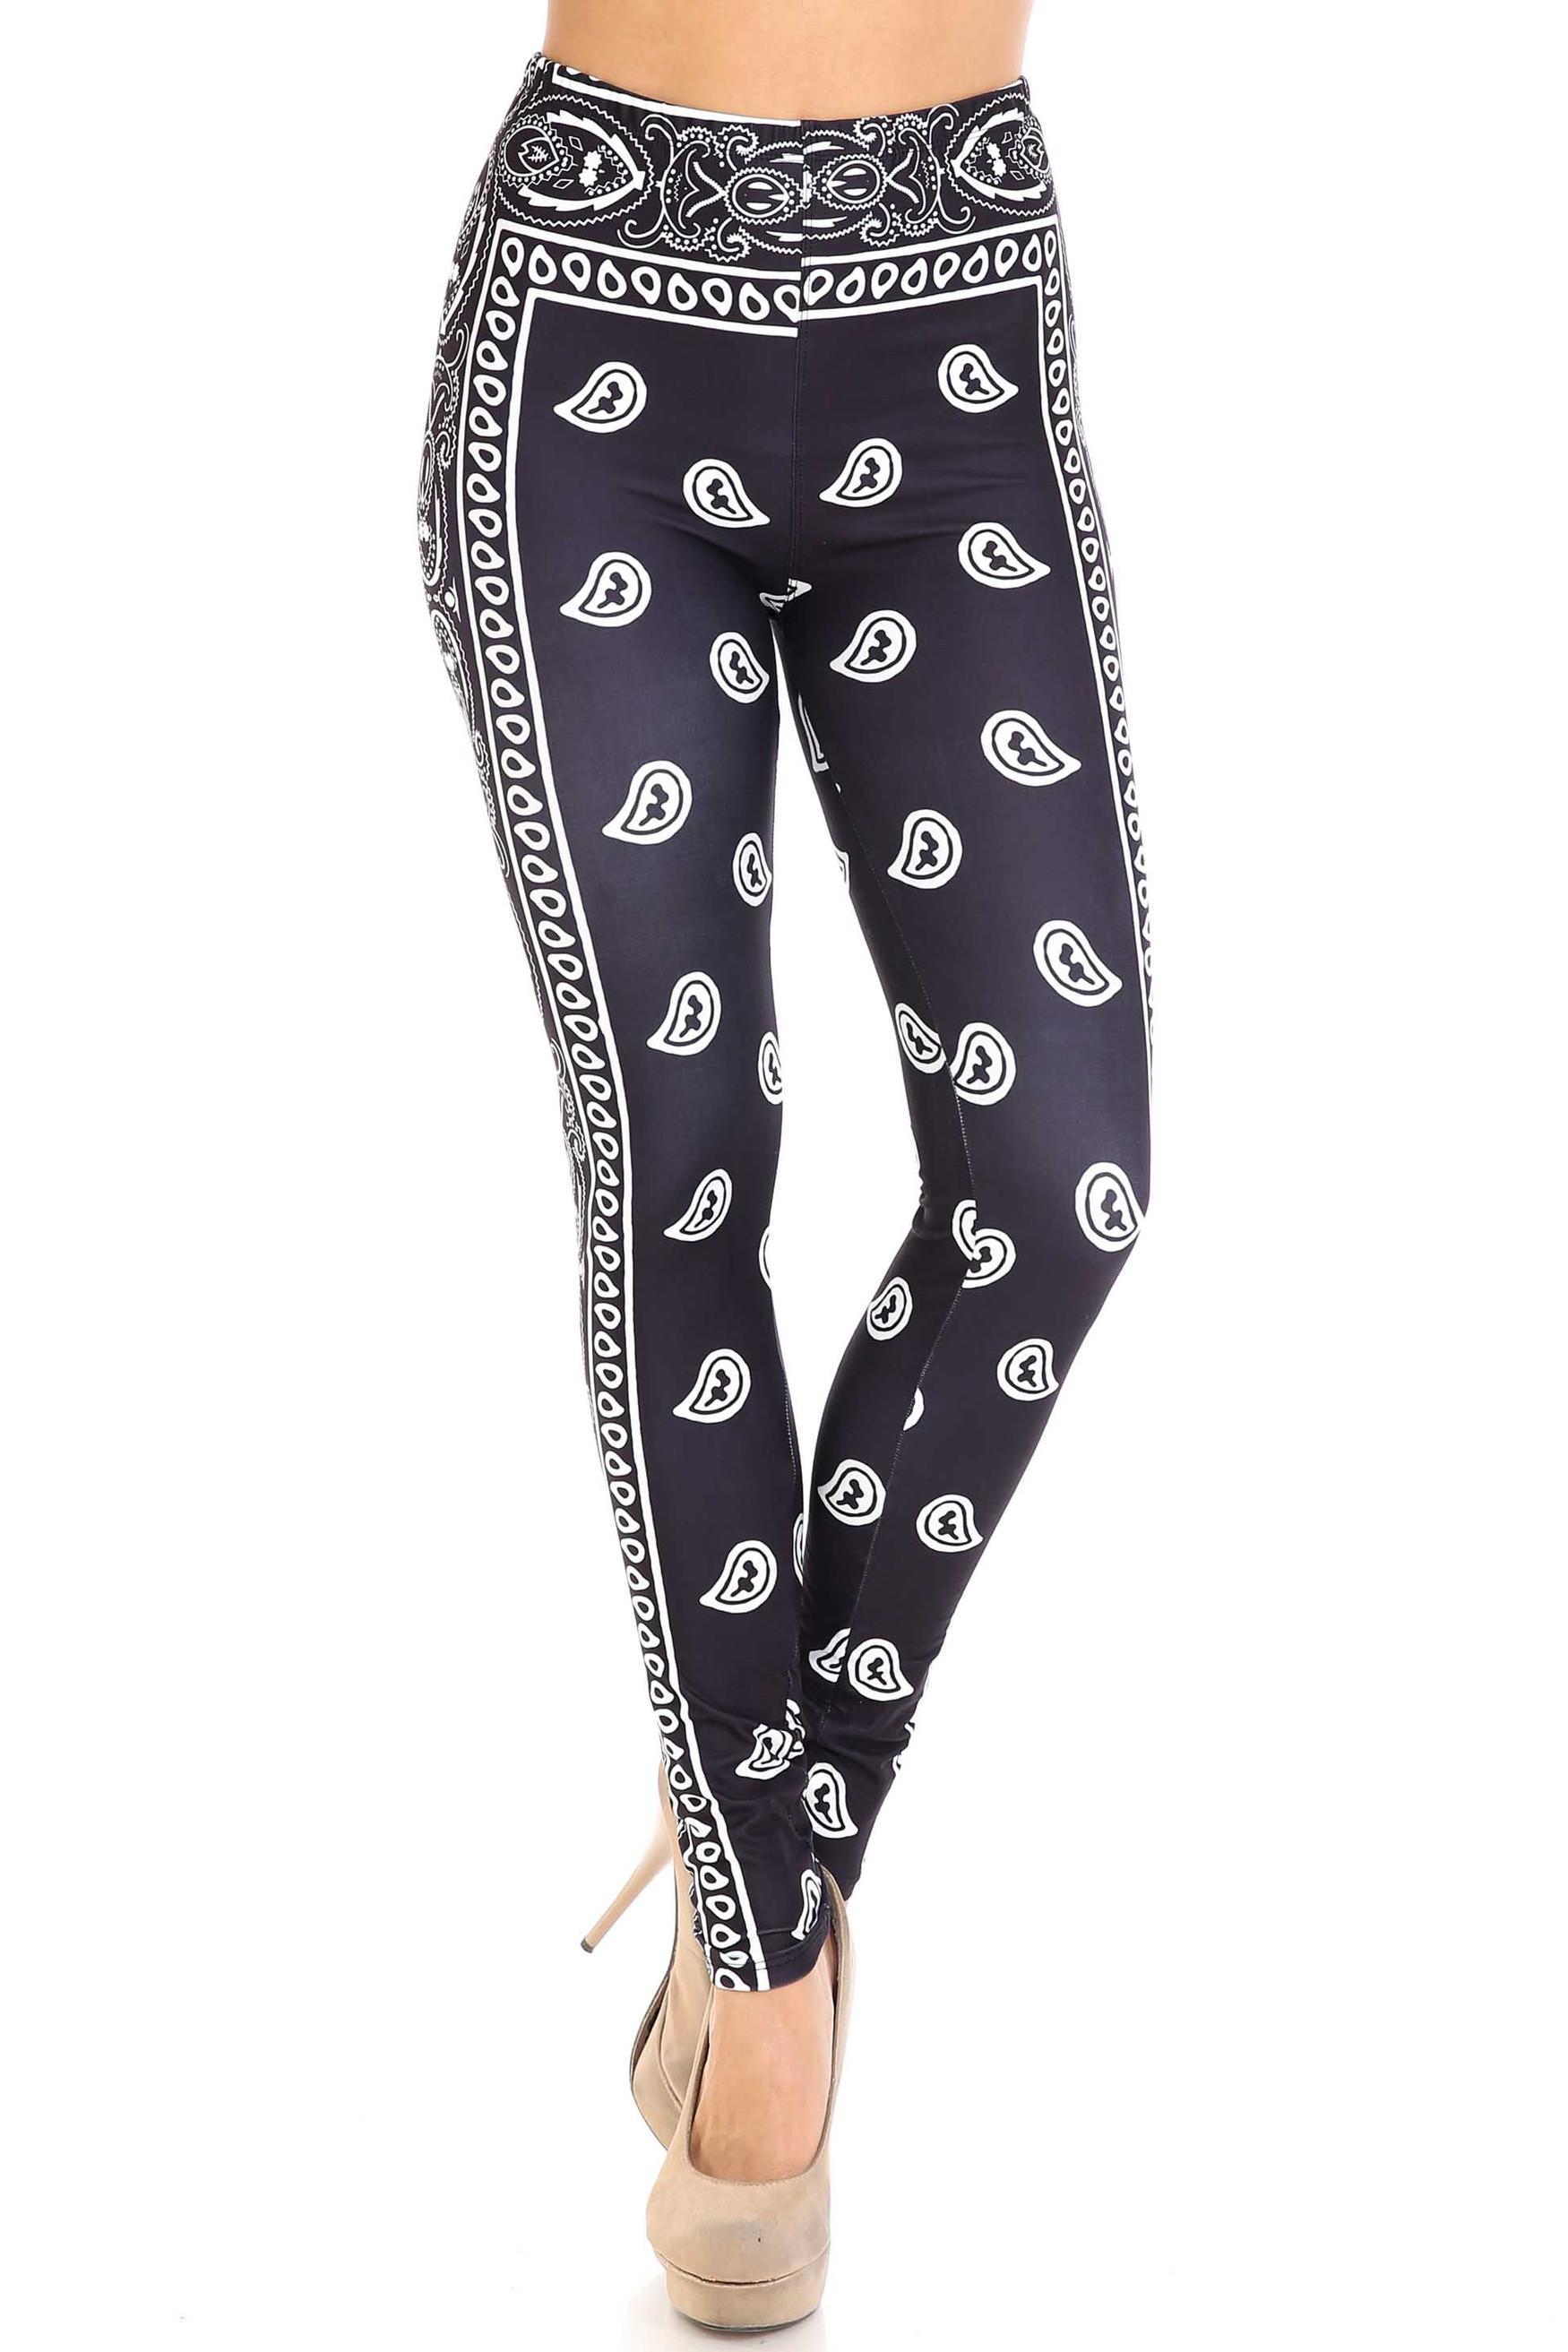 Creamy Soft Black Bandana Extra Plus Size Leggings - 3X-5X - USA Fashion™